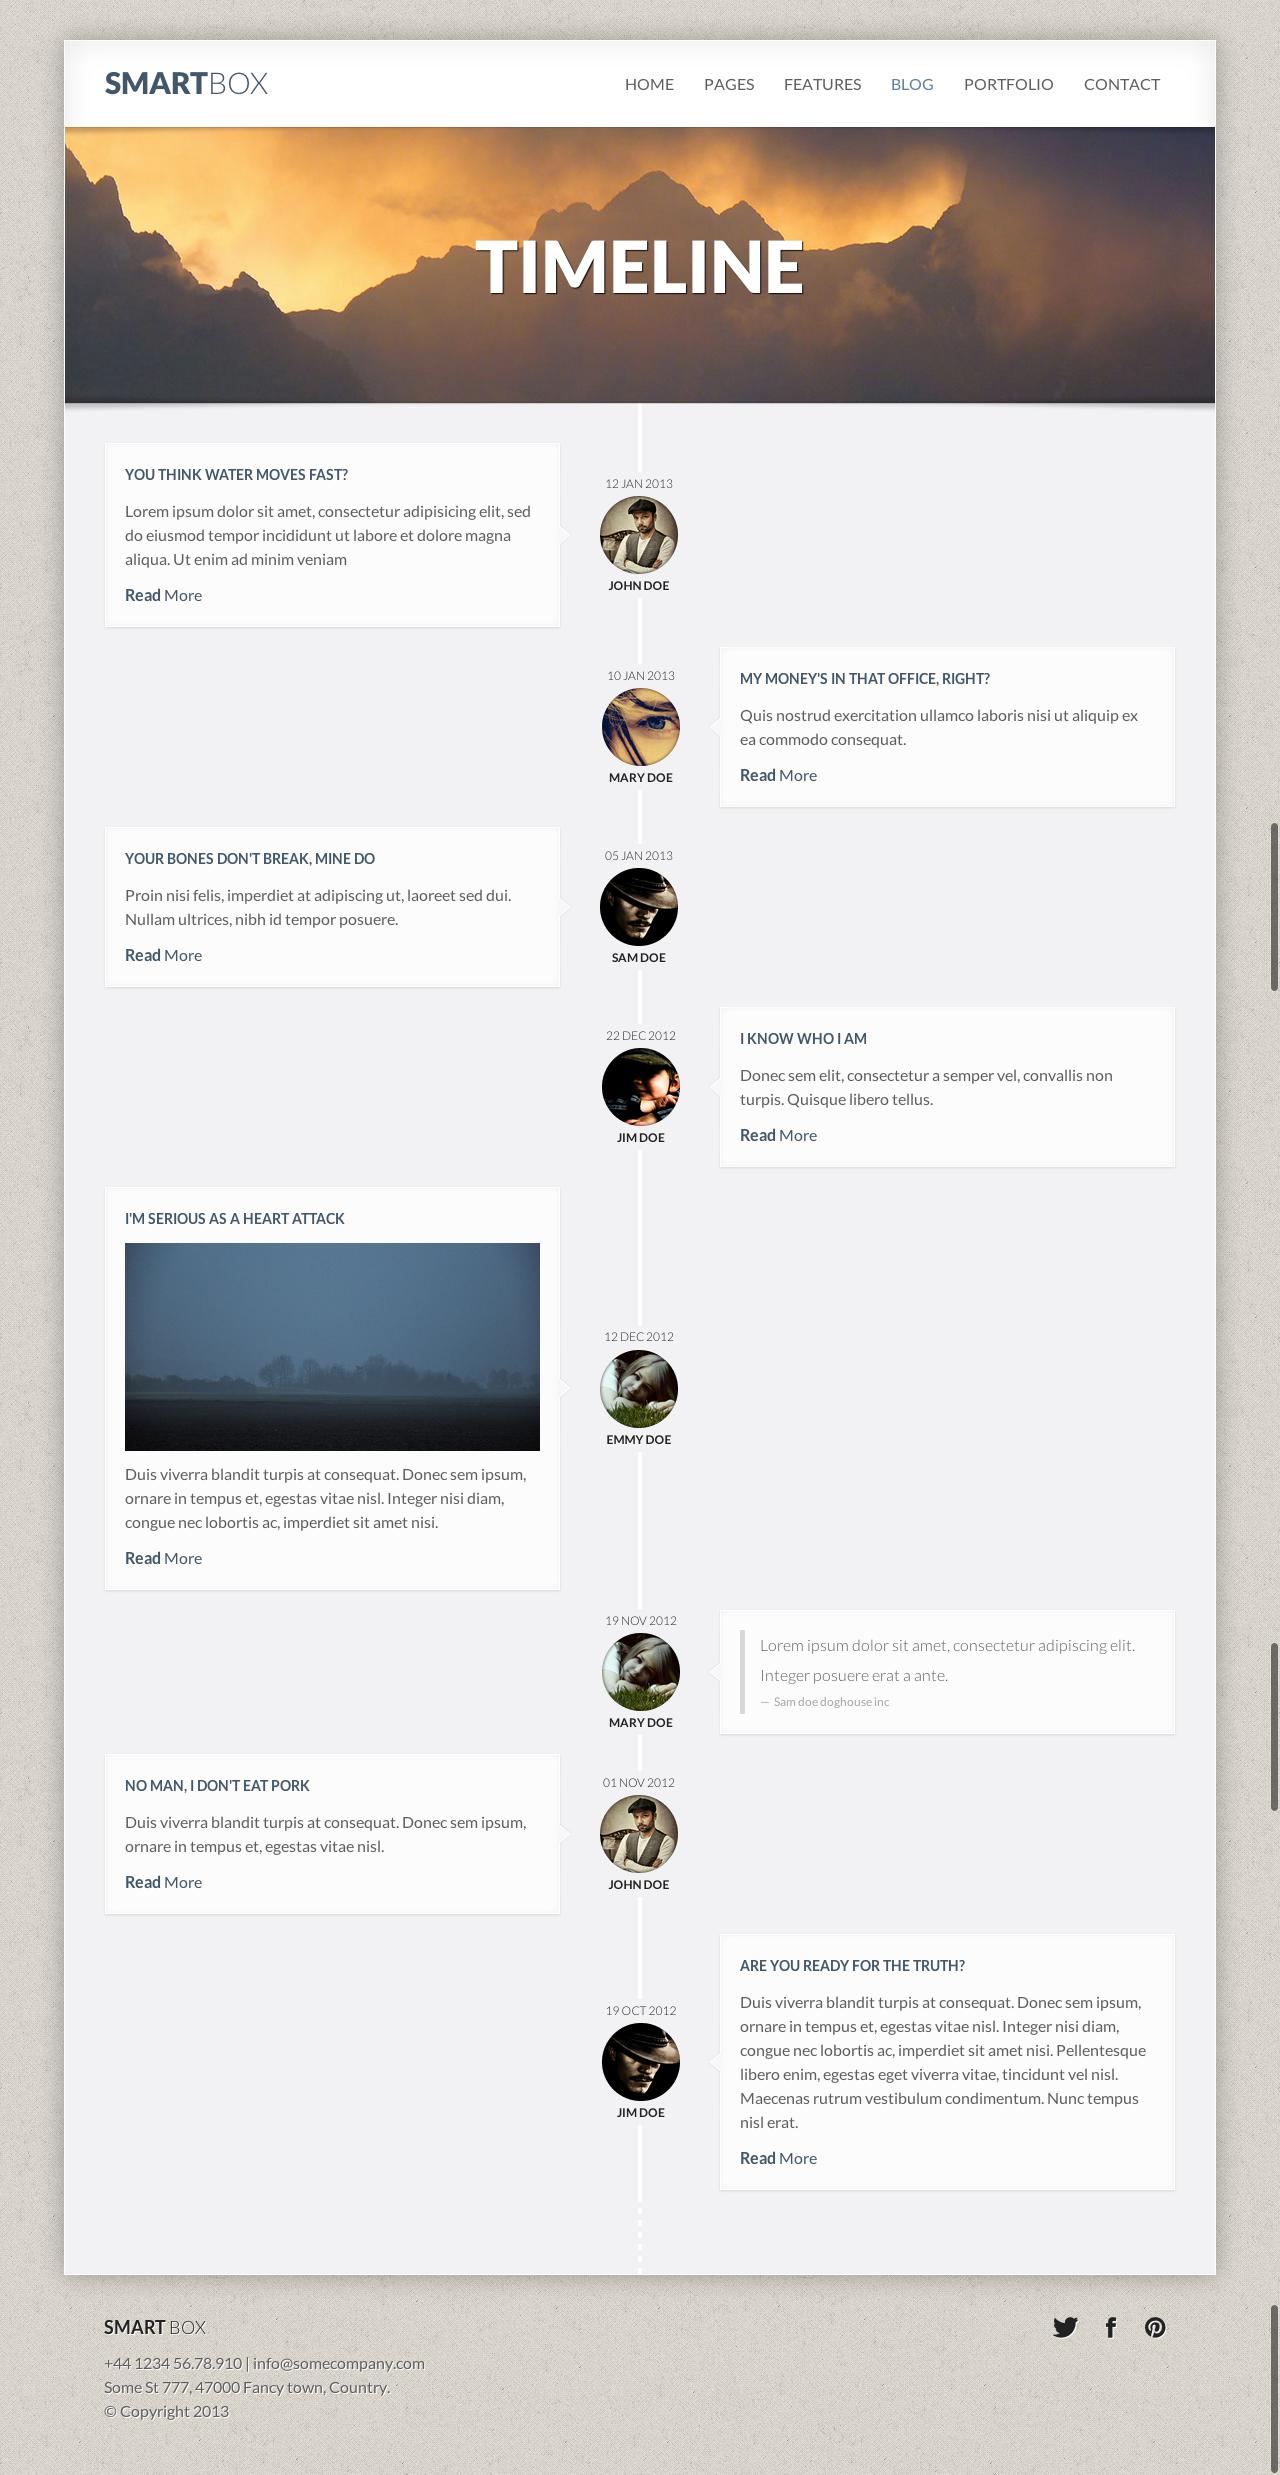 SmartBox Responsive WordPress Bootstrap Theme - Timeline website template